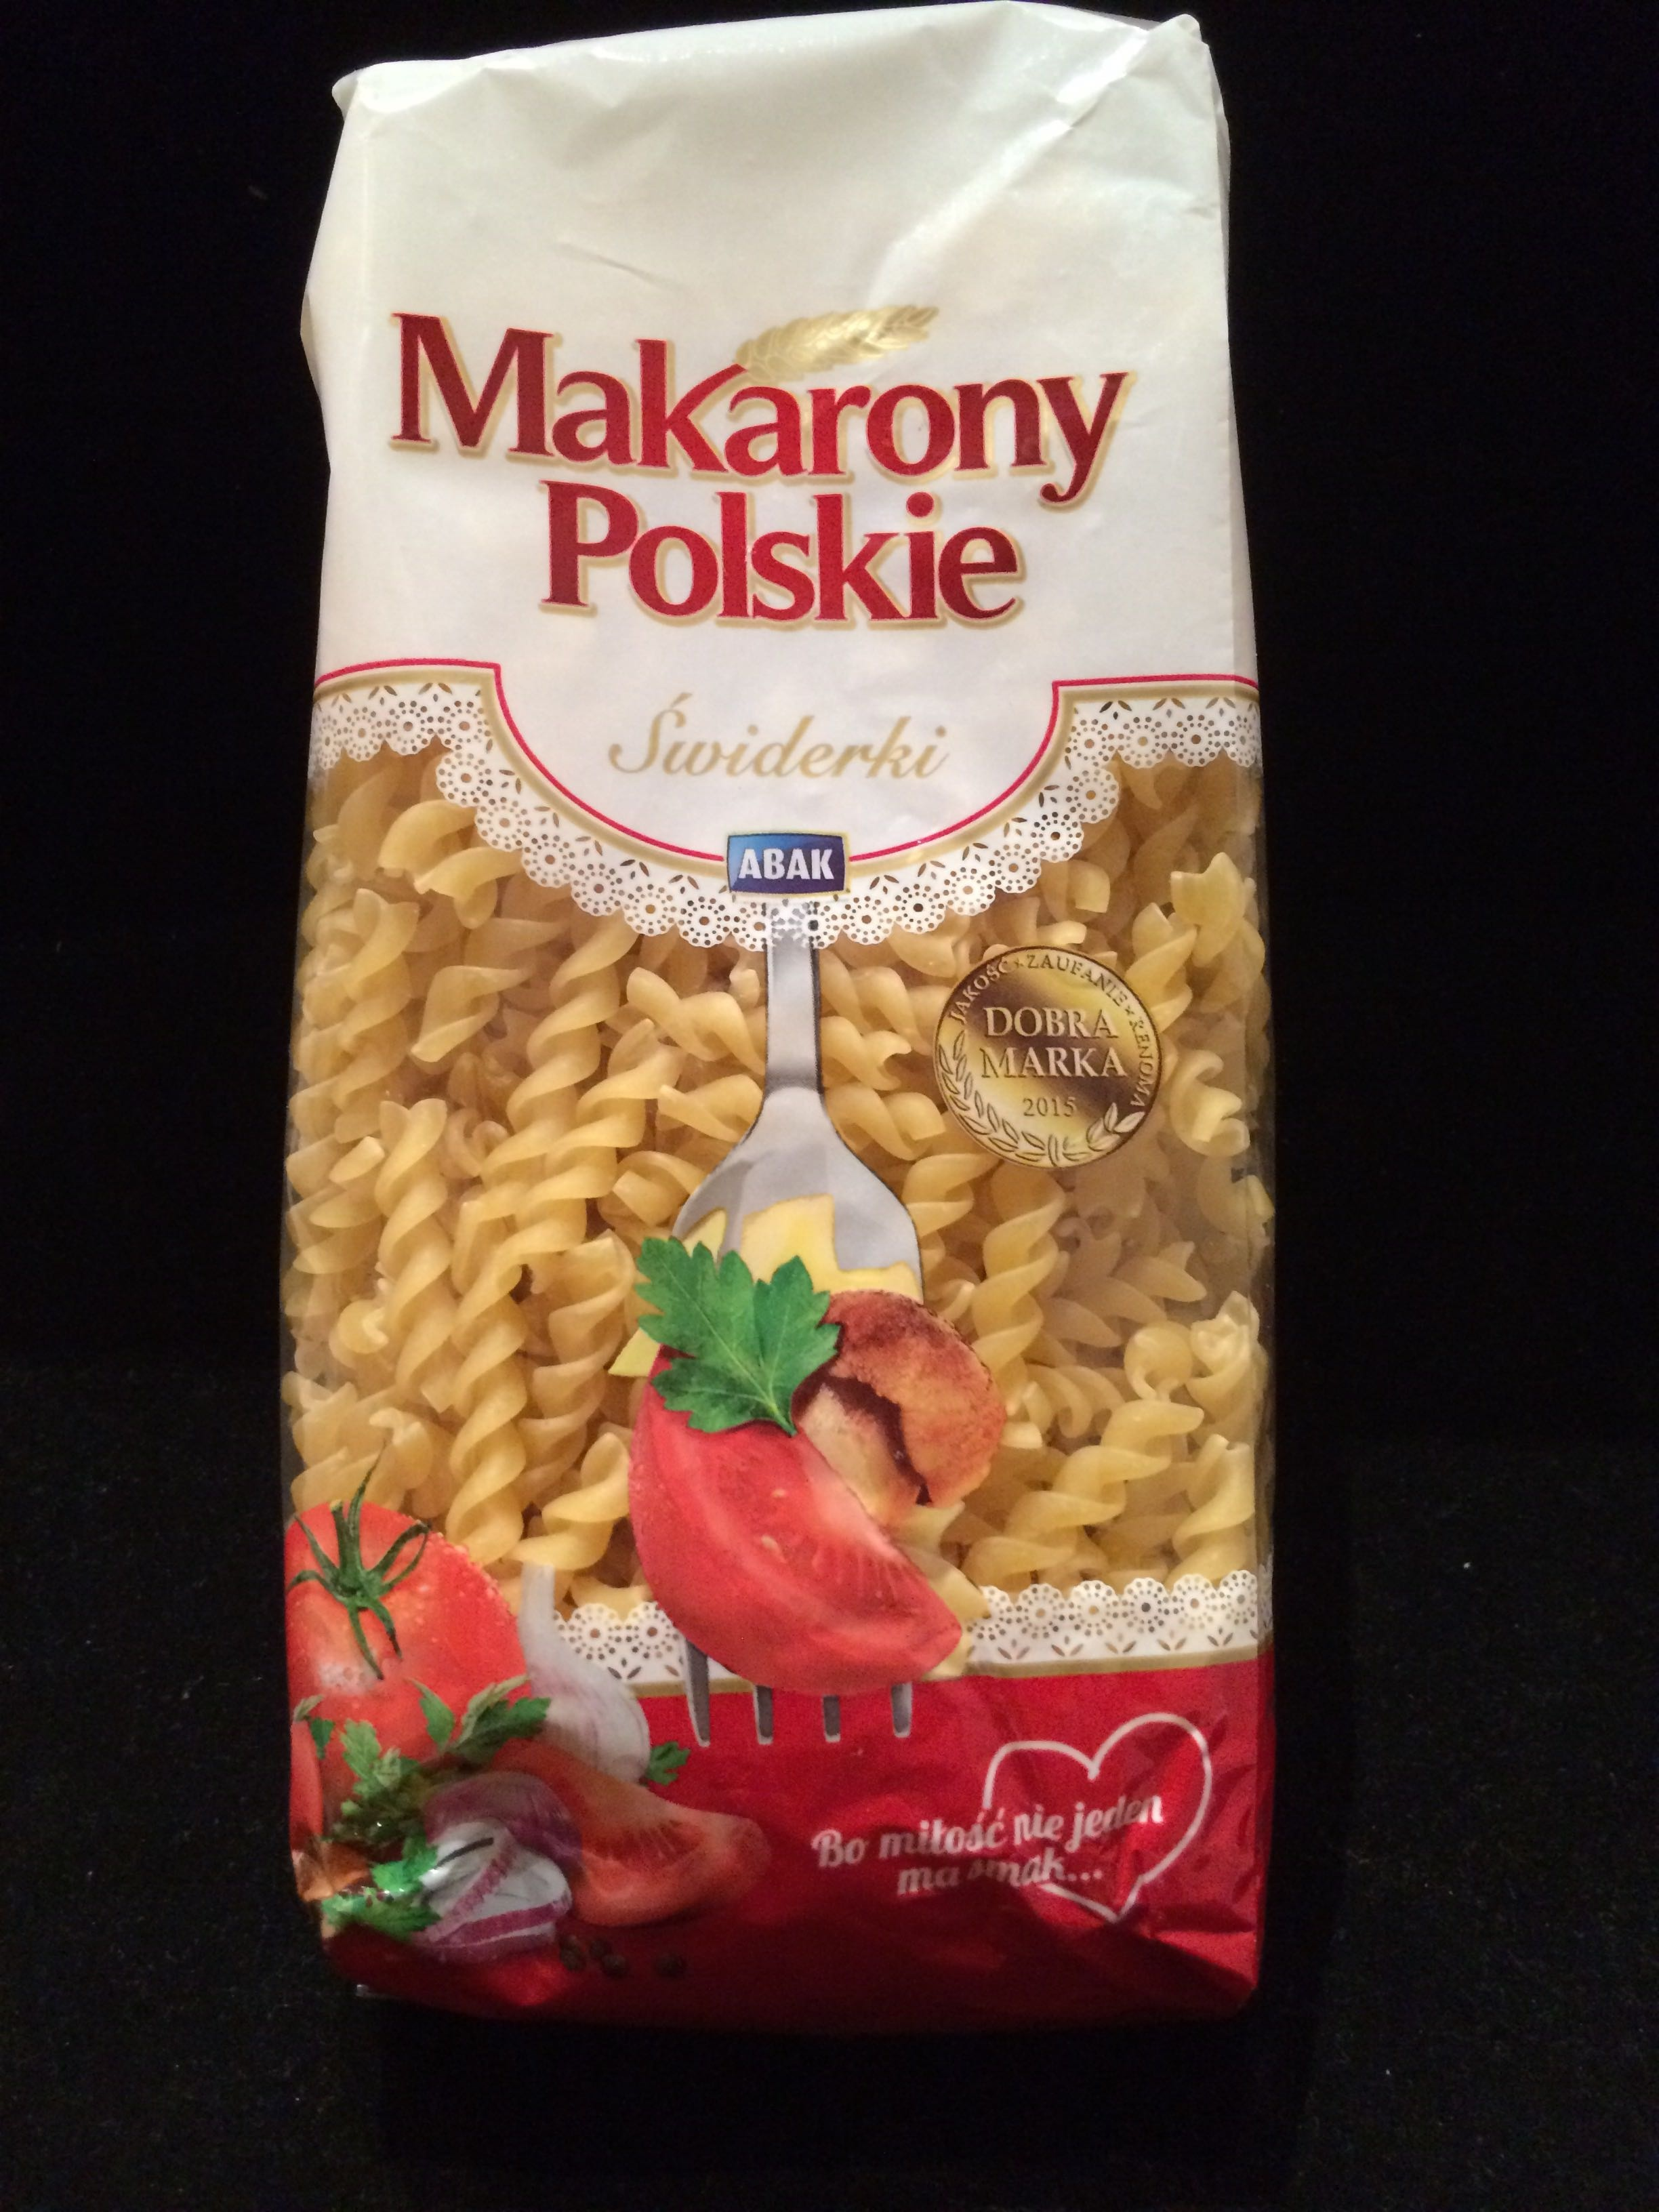 Swiderki spirals noodle pasta - Product - en